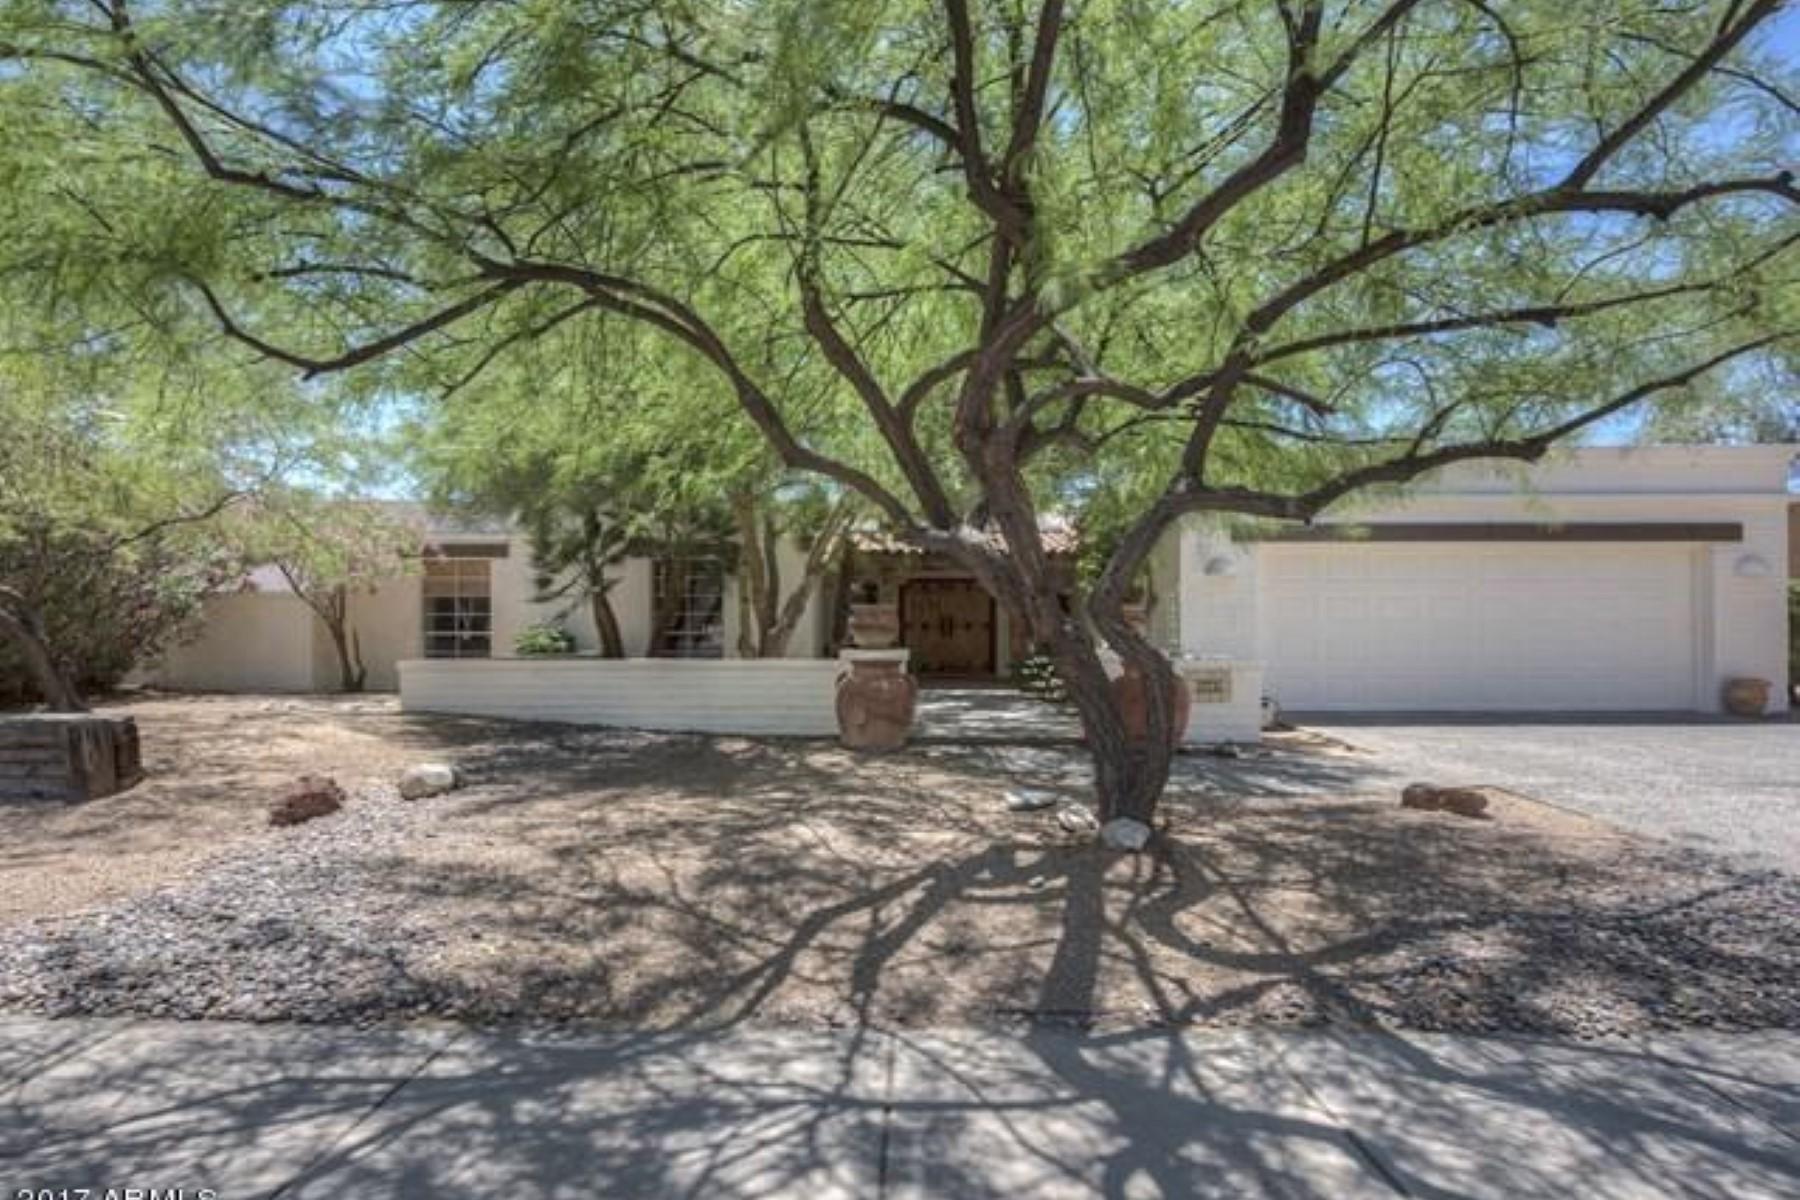 Casa para uma família para Venda às Beautiful home in the desirable McCormcik Ranch community 7607 E Via De Corto Scottsdale, Arizona, 85258 Estados Unidos